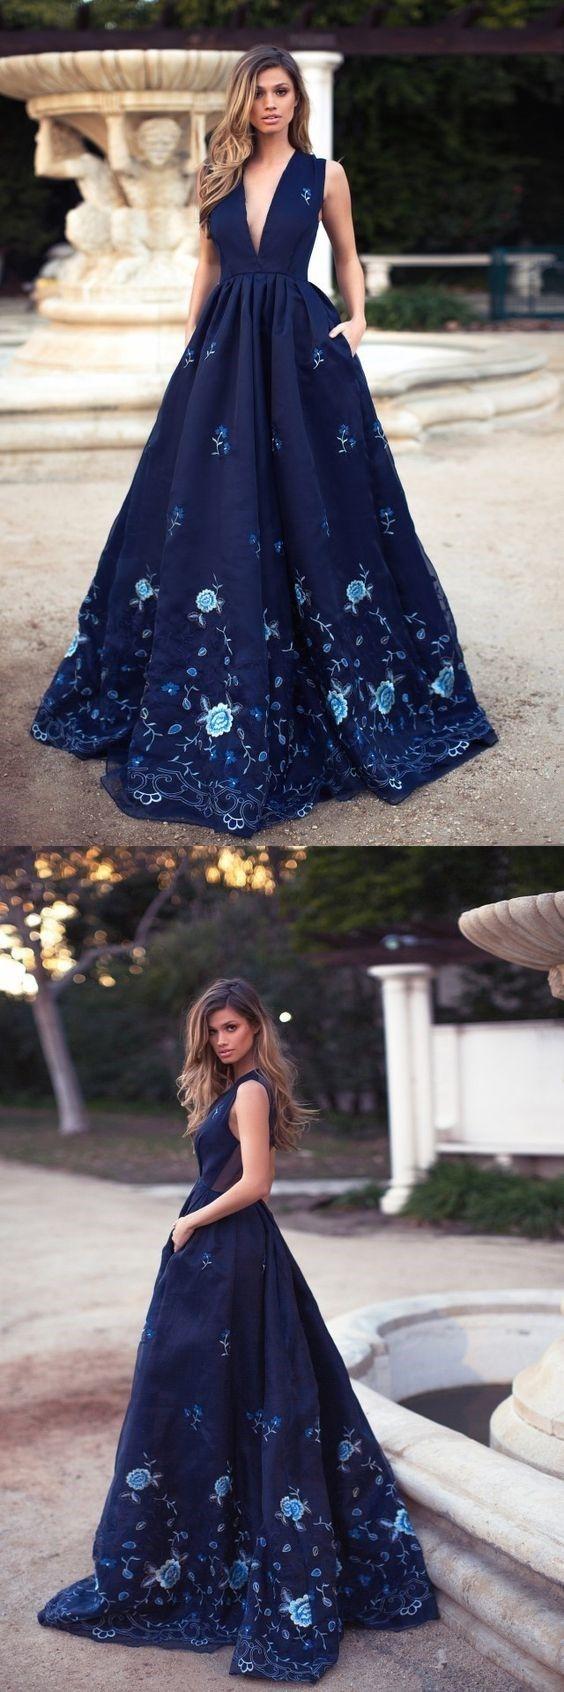 A-Line Deep V-Neck Navy Blue Evening Prom Dress with Appliques Pockets #navybluepromdresses #SimpleAlinePromDresses #prom #dresses #longpromdress #promdress #eveningdress #promdresses #partydresses #2018promdresses #ballgown #eveninggown #promgown